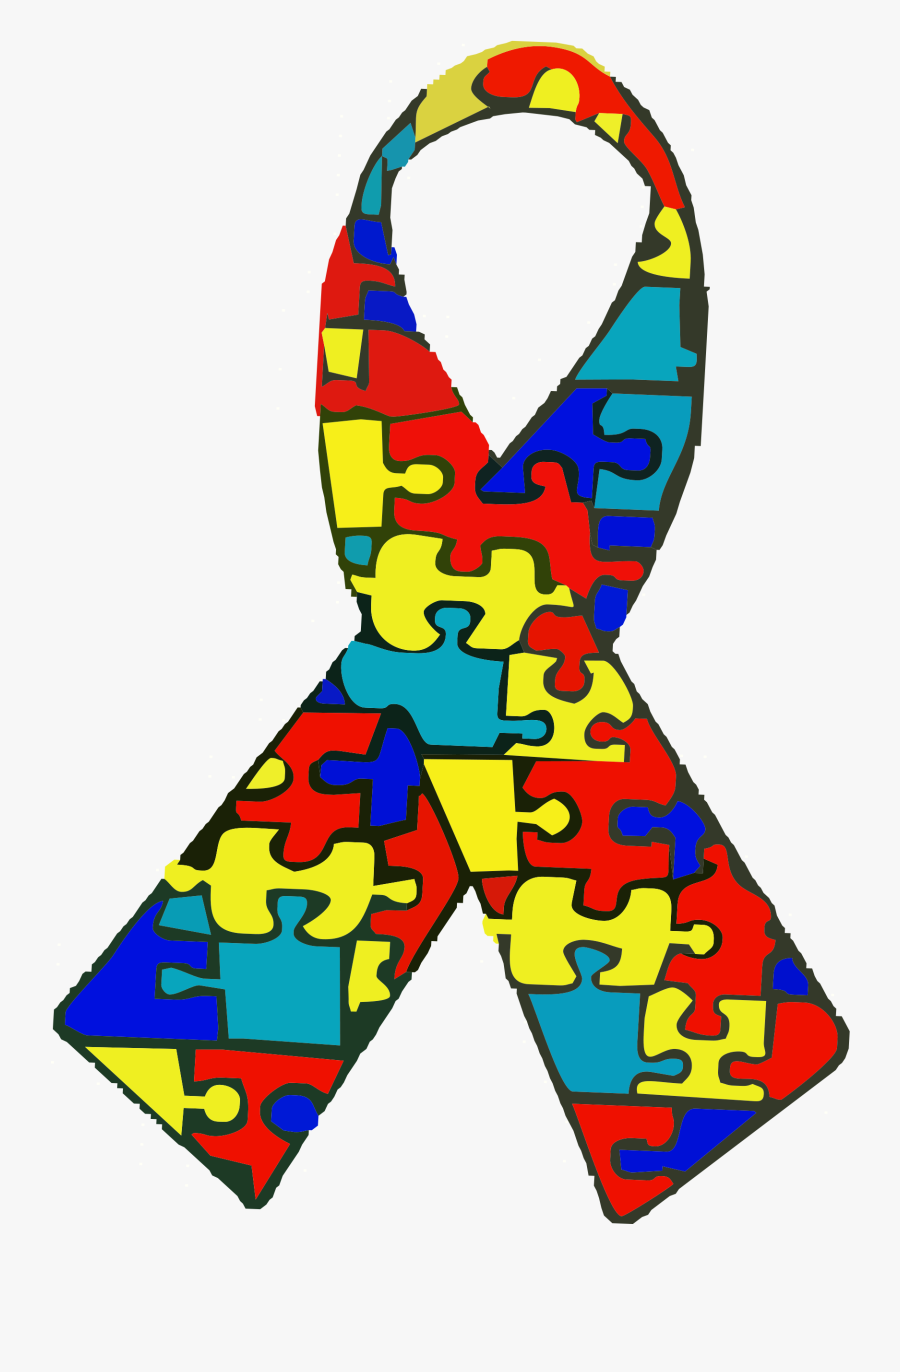 Autism Spectrum Disorder Logo Clipart , Png Download - Autism Spectrum Disorder Logo, Transparent Clipart